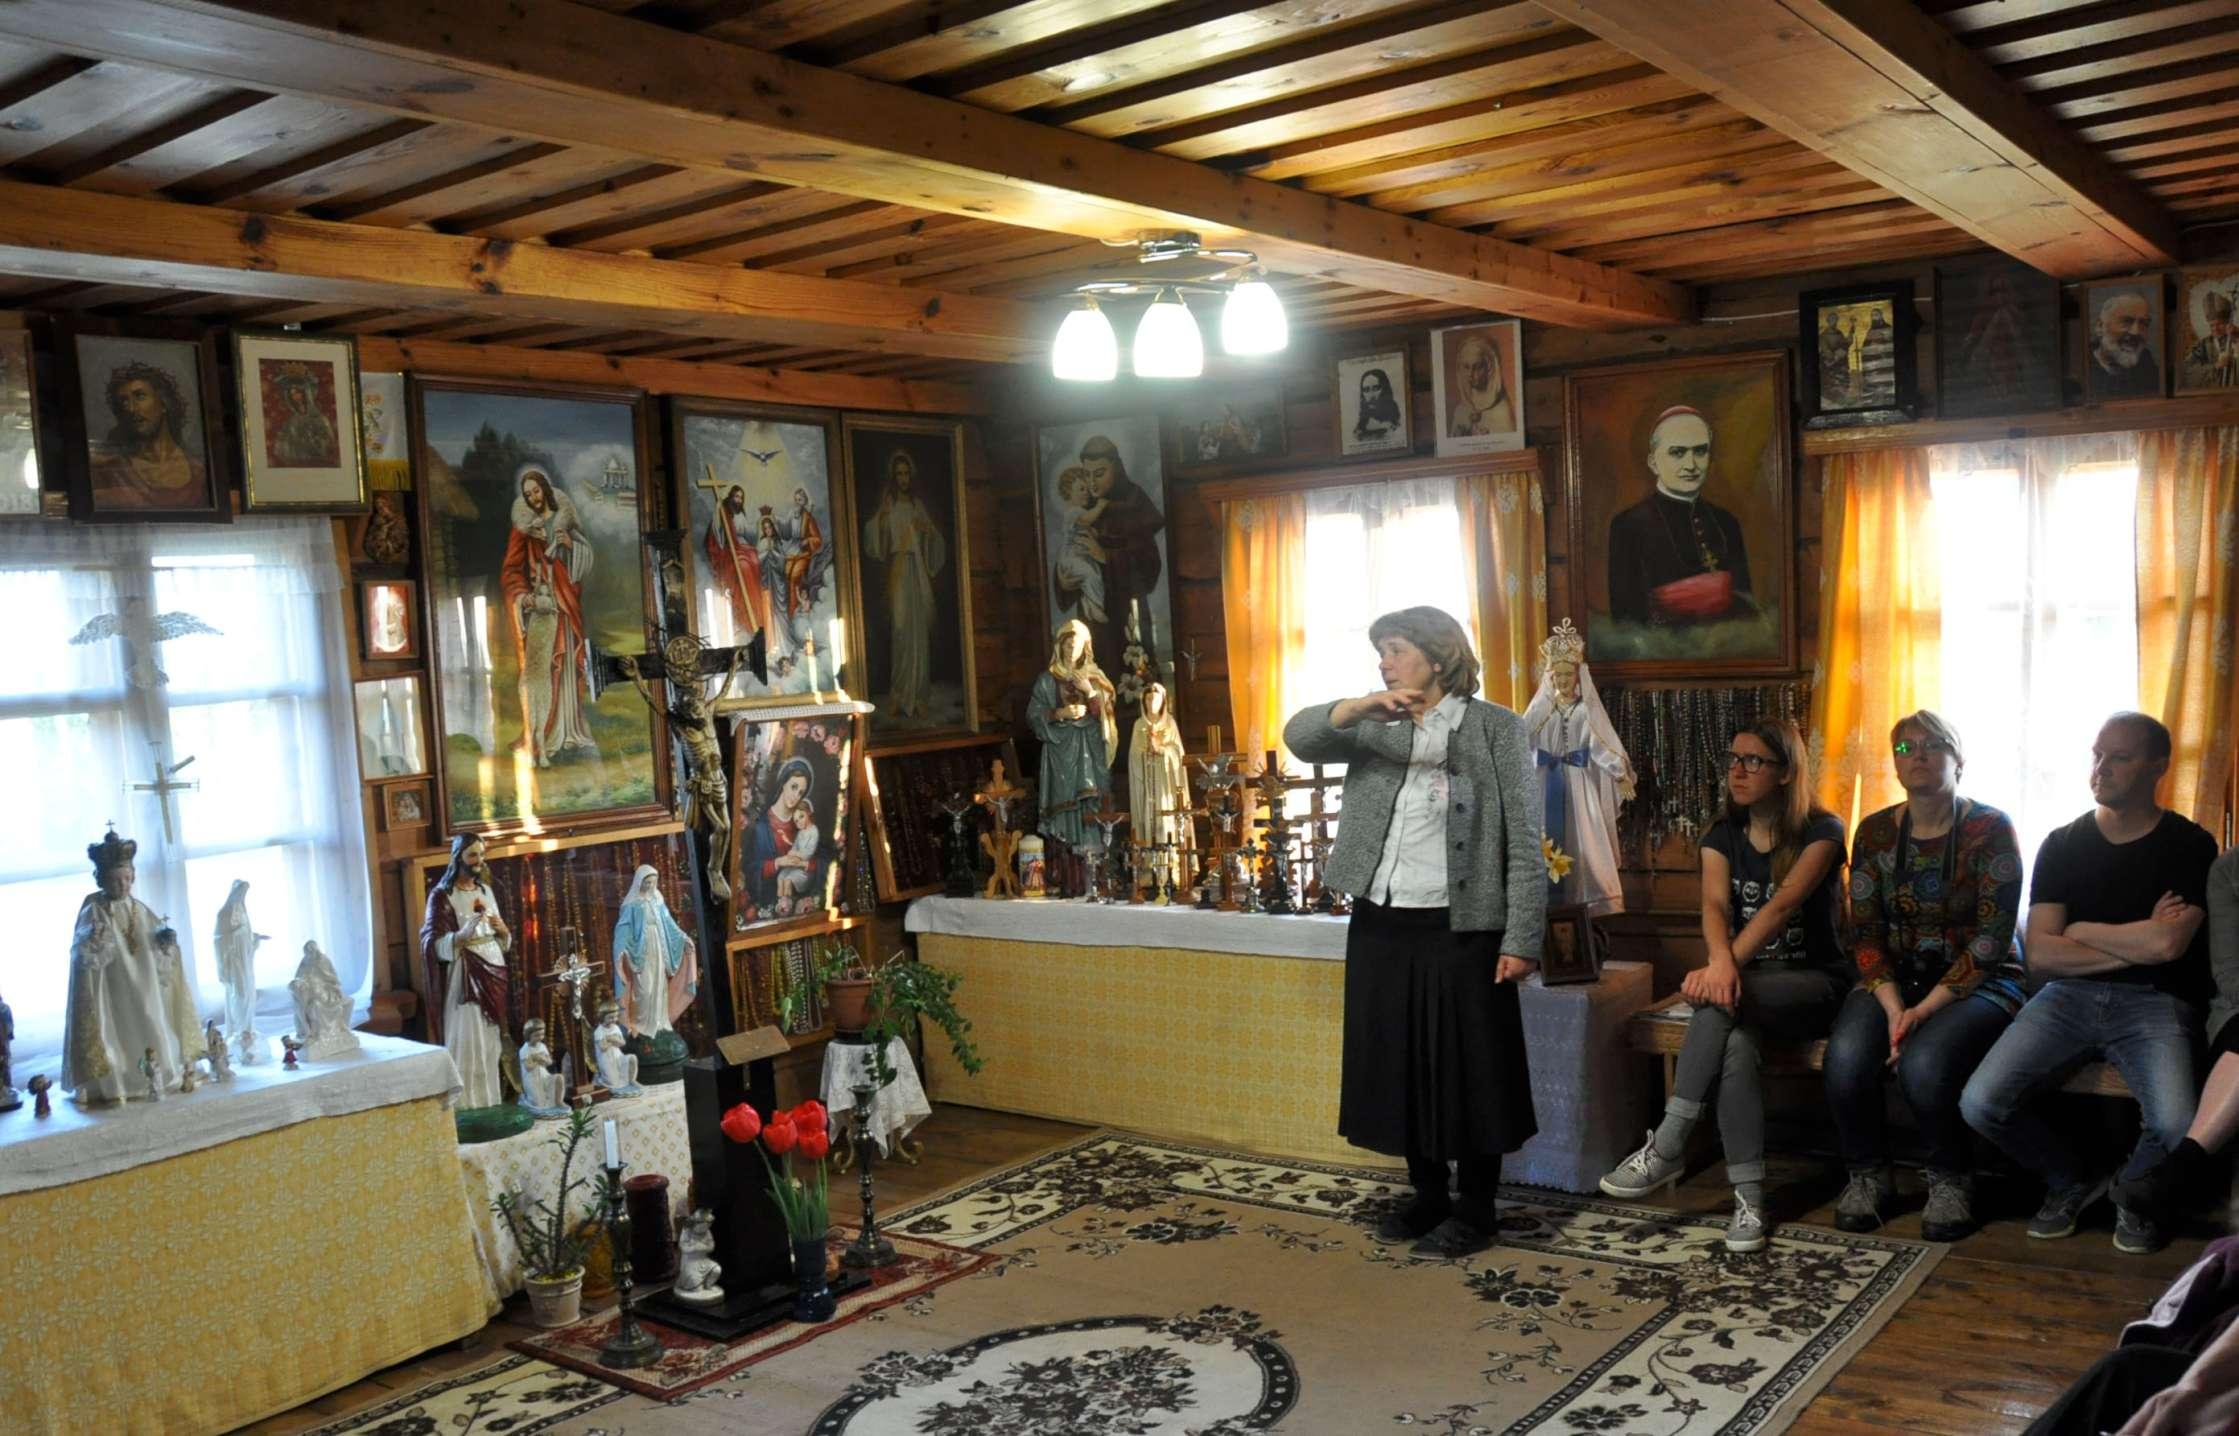 Keturnaujienos koplyčios viduje   V. Davydovo nuotr.